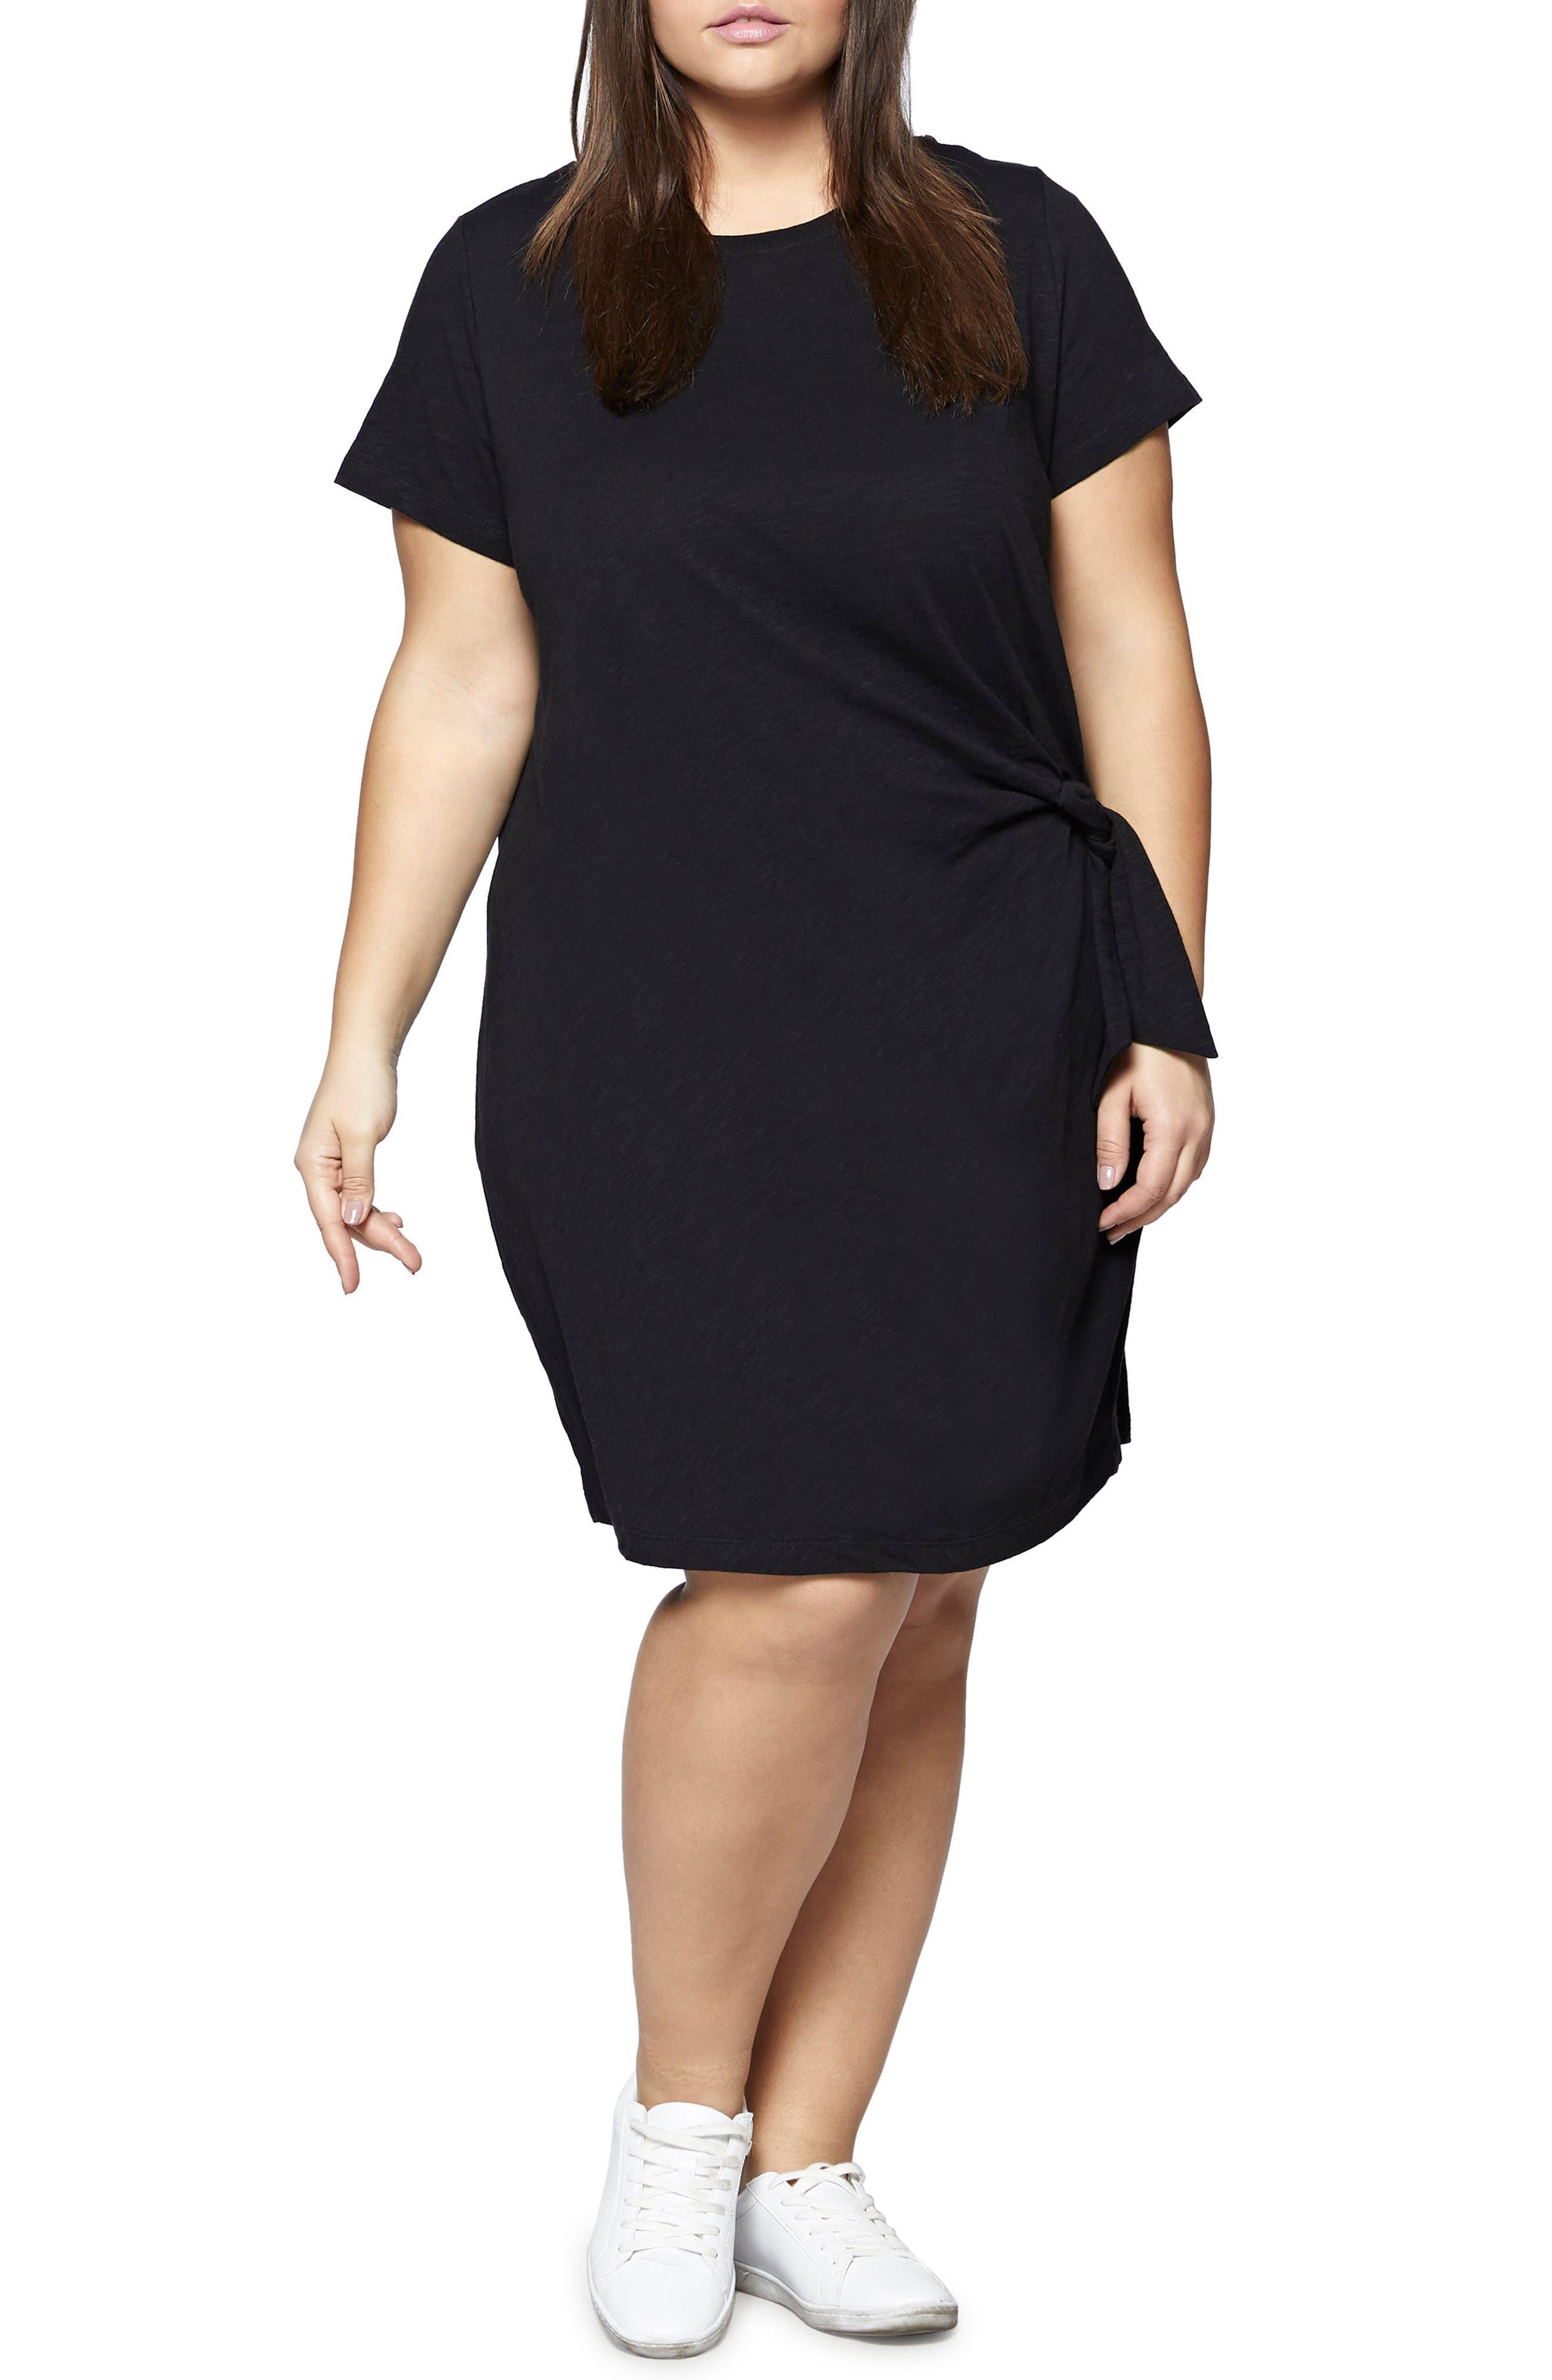 Wrapsody Dress,                         Main,                         color, 001